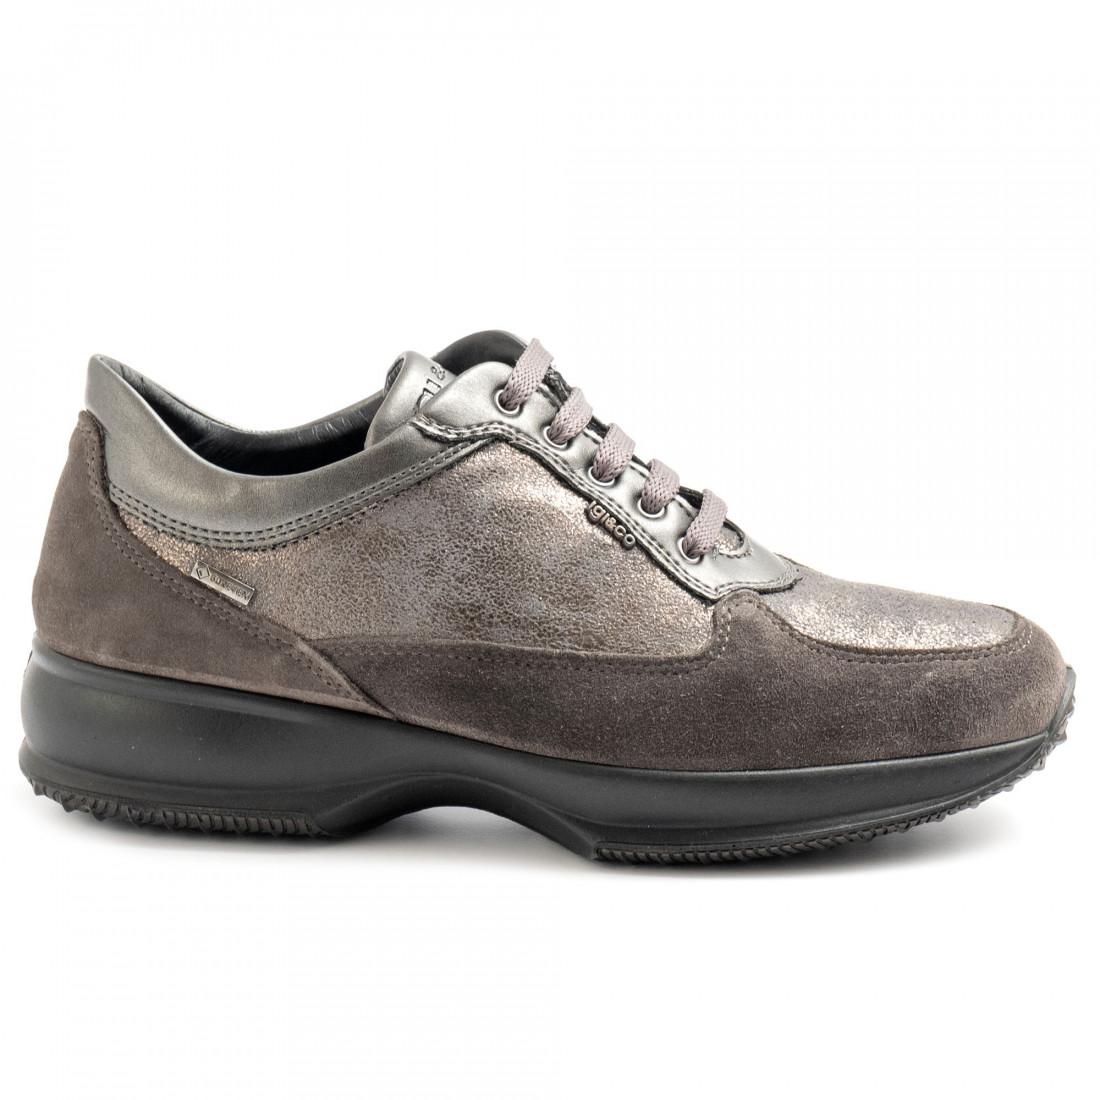 sneakers woman igico 414451141445 6232